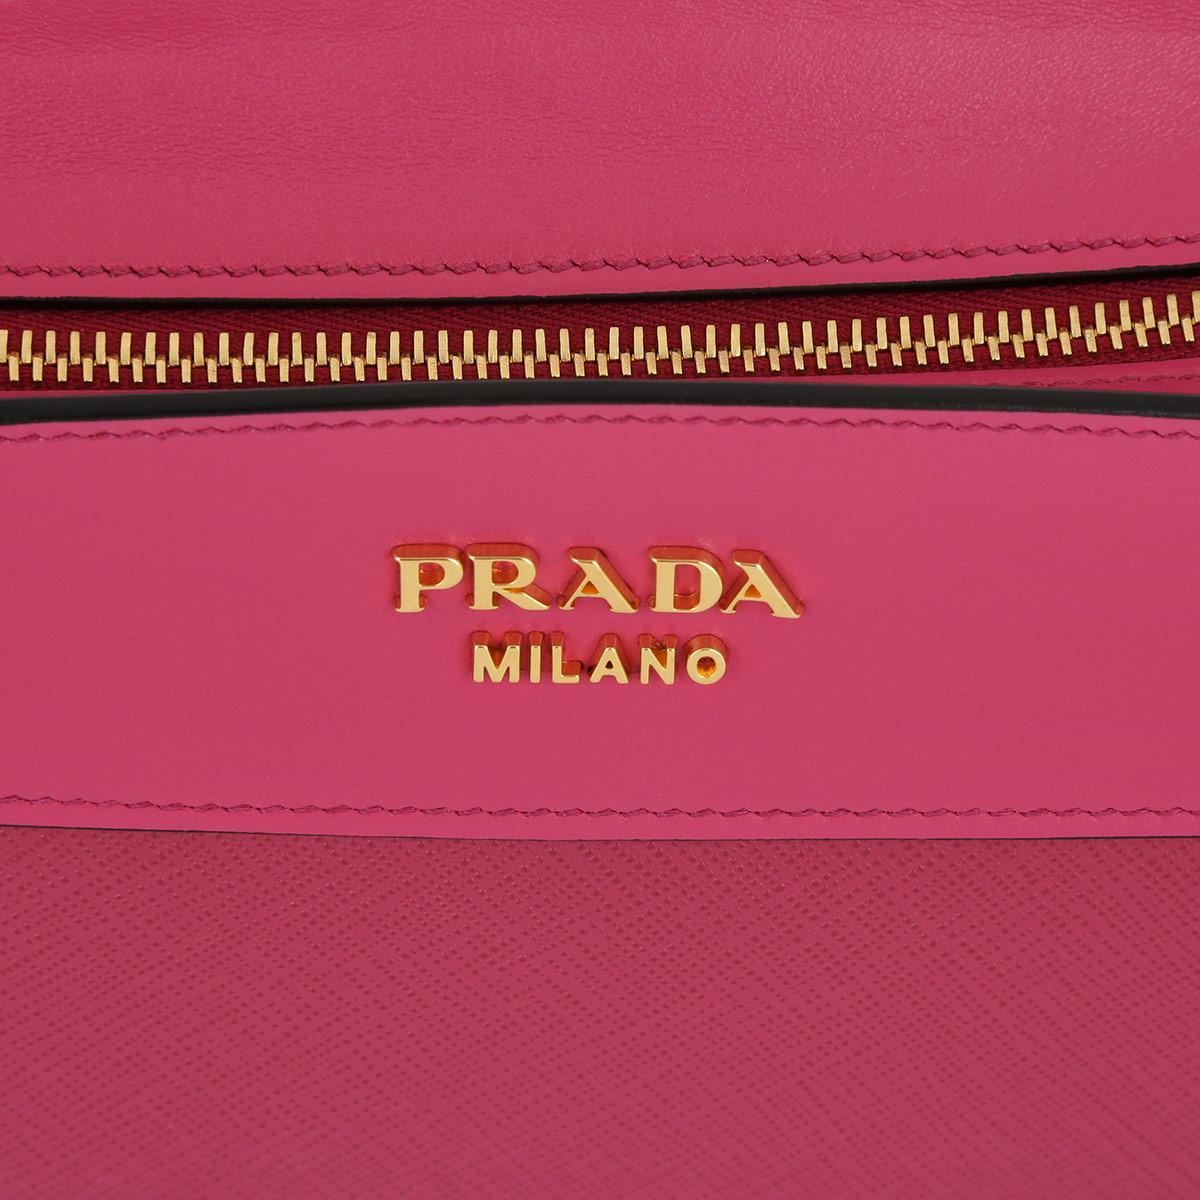 Prada Leather Esplanade Saffiano+city Calf Crossbody Fuxia in Pink